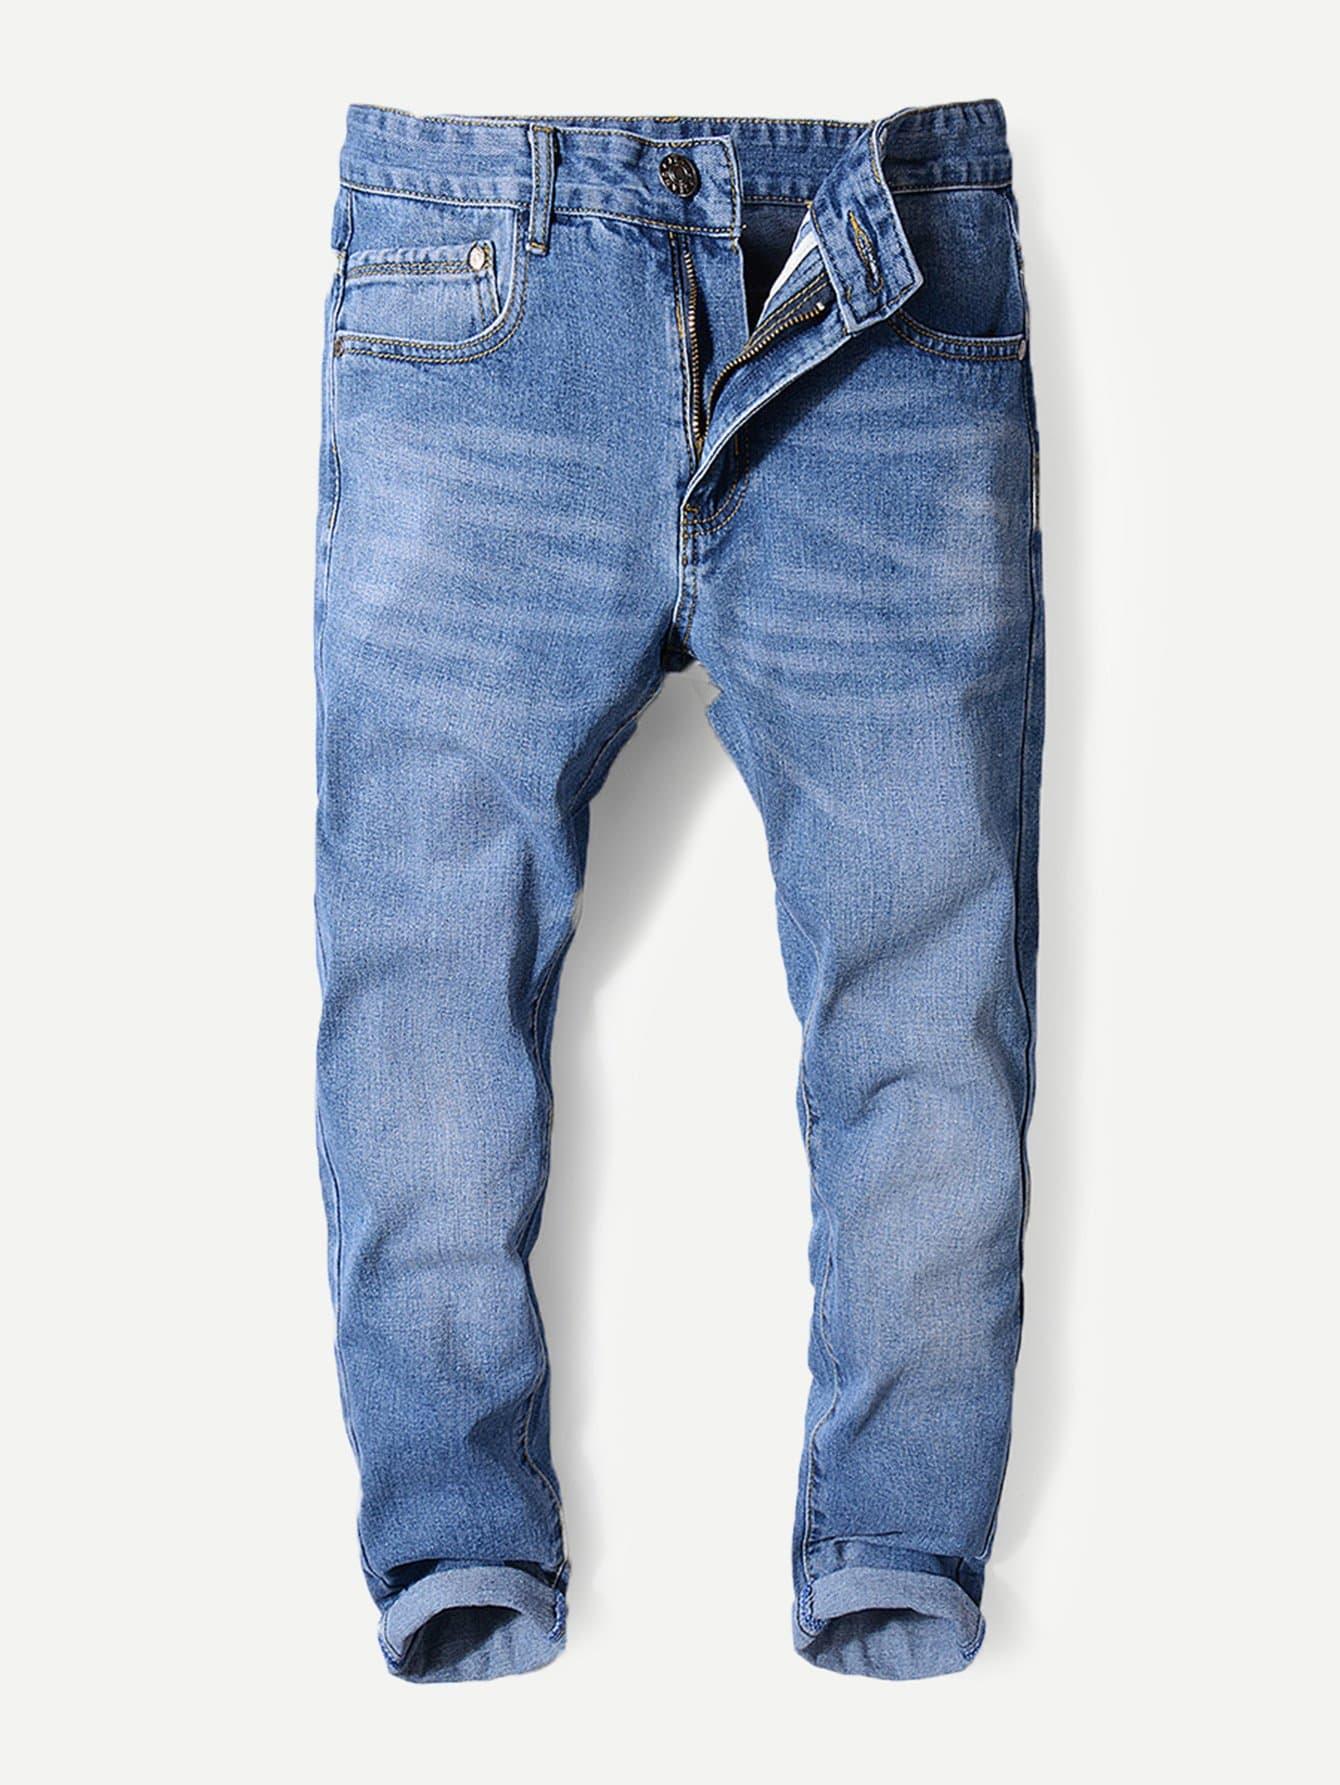 37 Inch Waist Jeans For Men